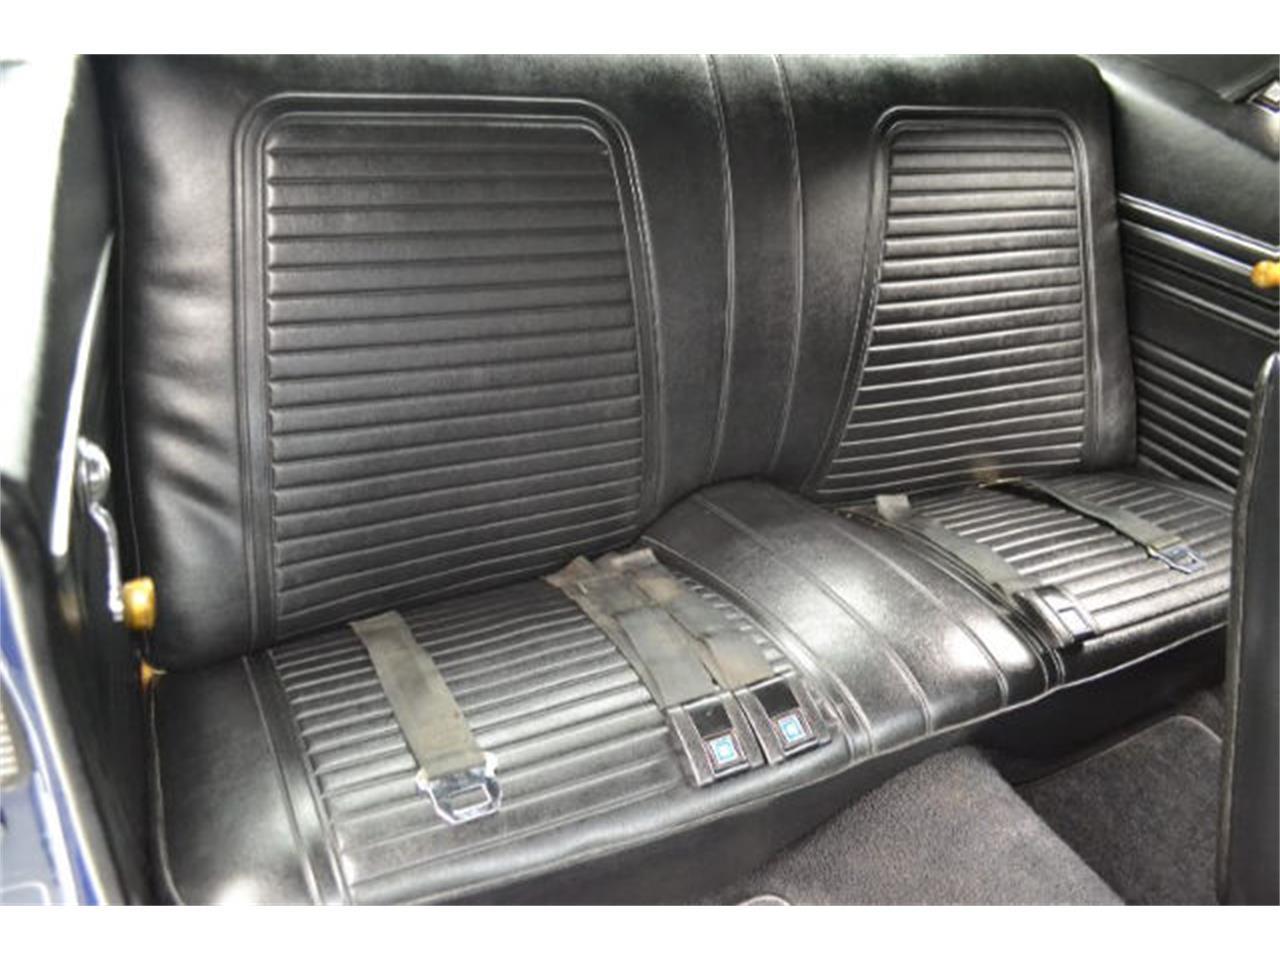 Large Picture of Classic '69 Camaro located in North Carolina - $69,995.00 - JRD8